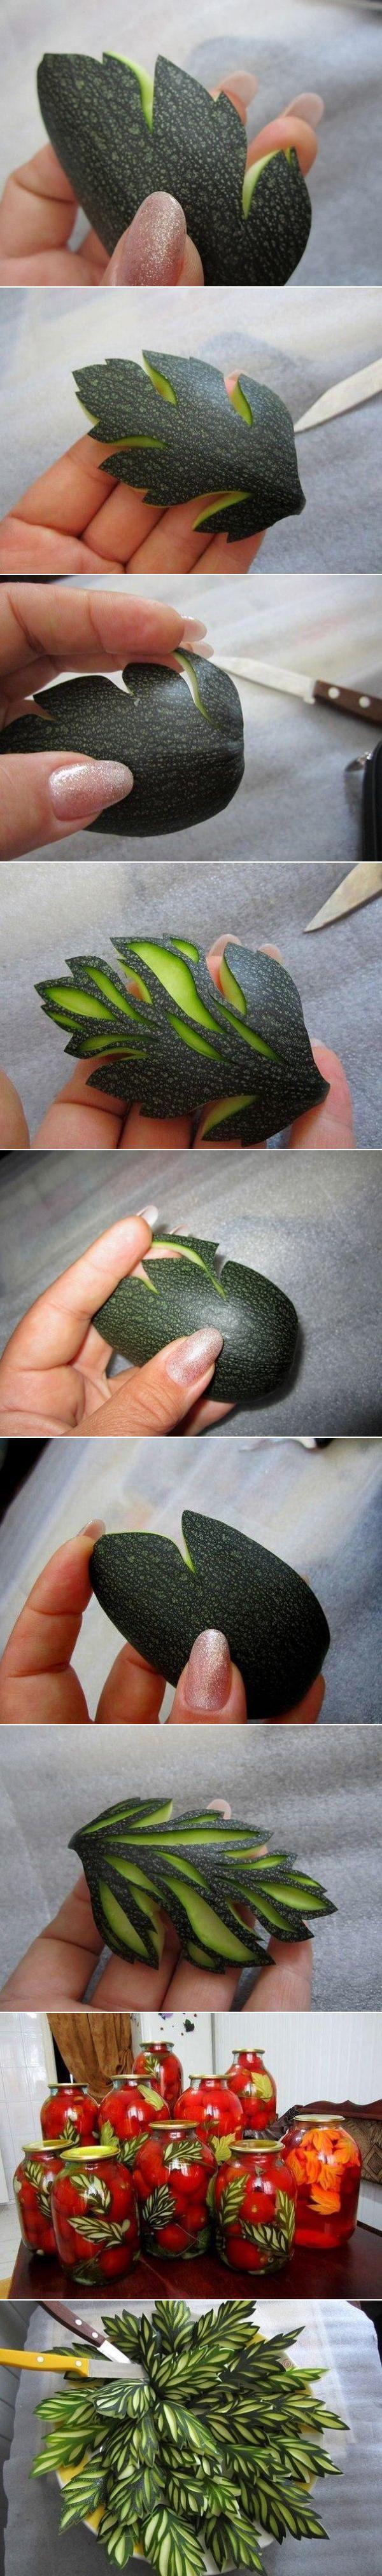 Food Carving                                                                                                                                                                                 Más